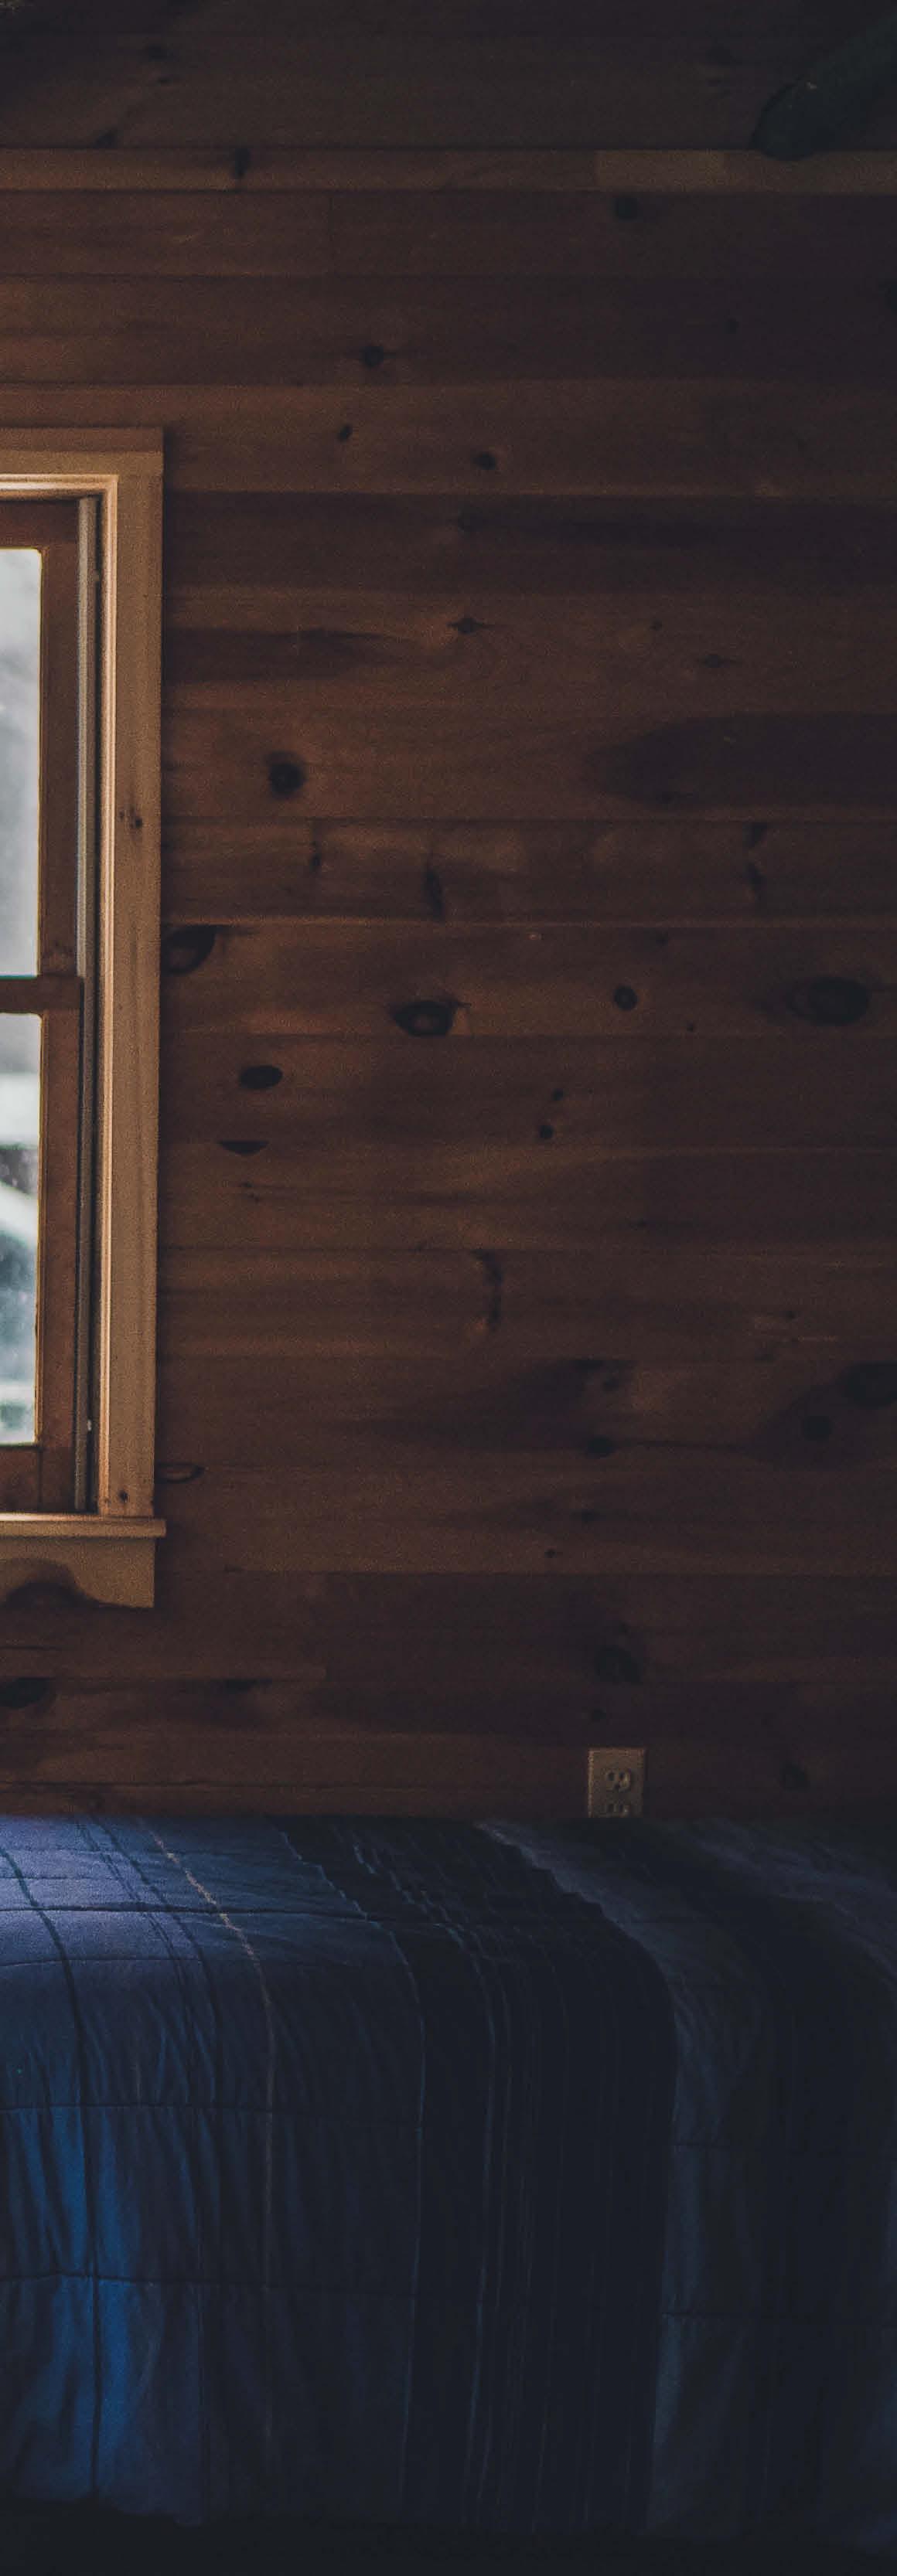 wood cabin walls - quarantine from covid-19